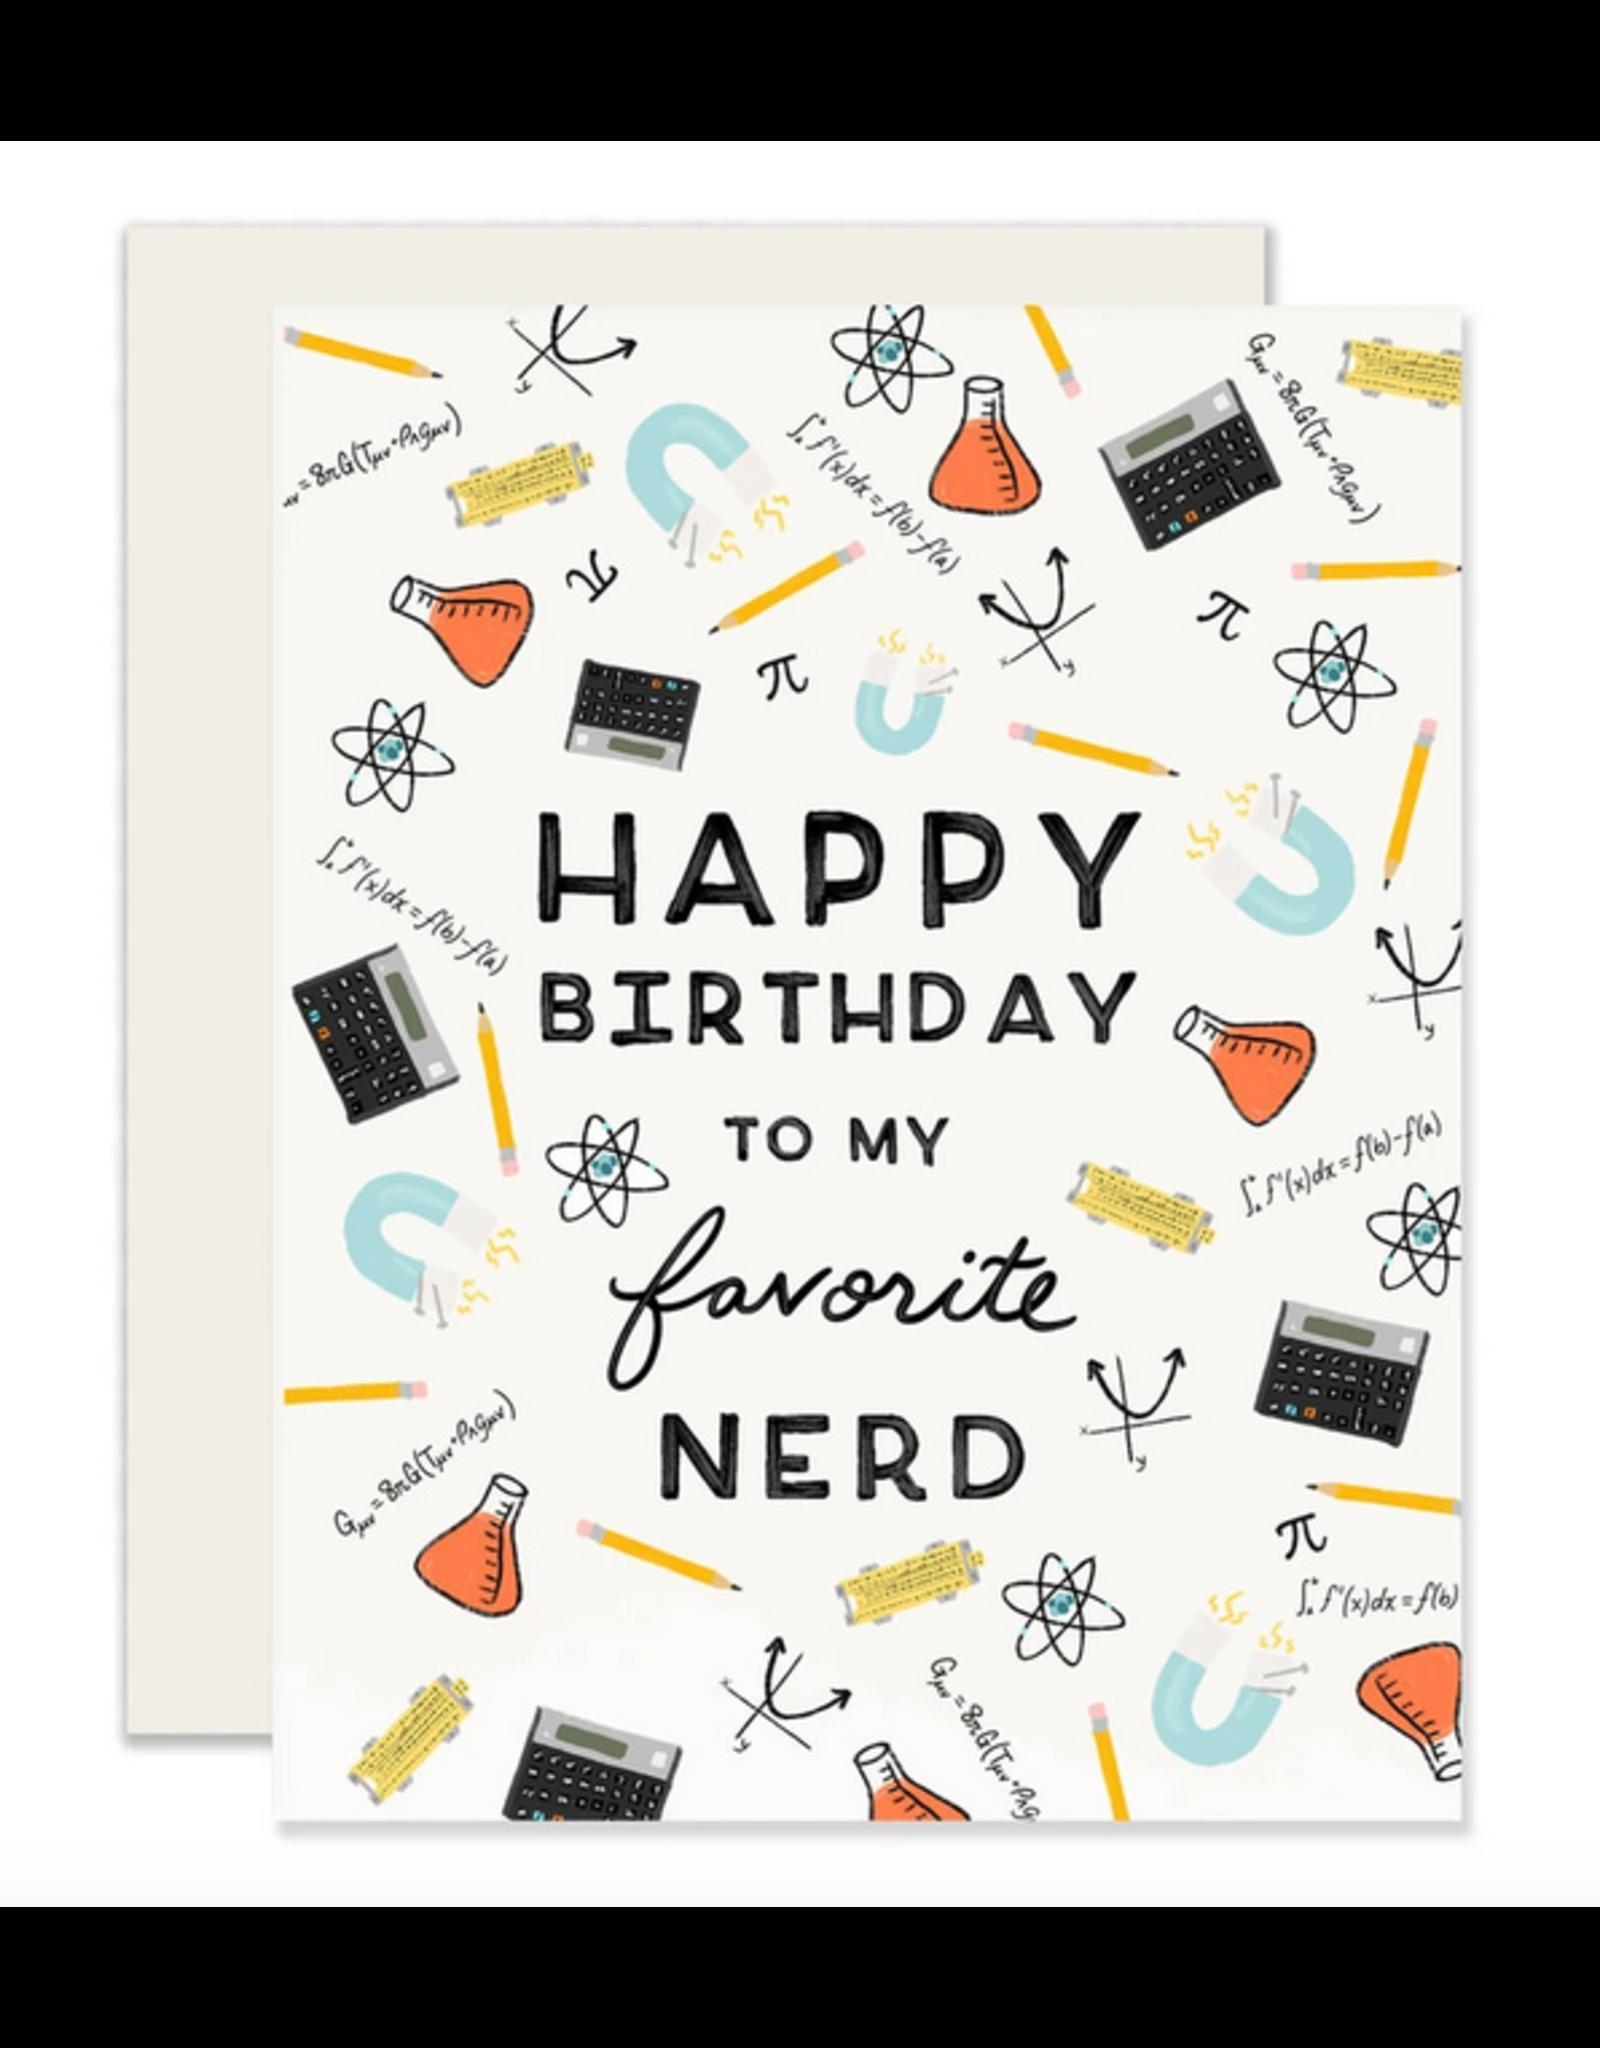 Favorite Nerd Card